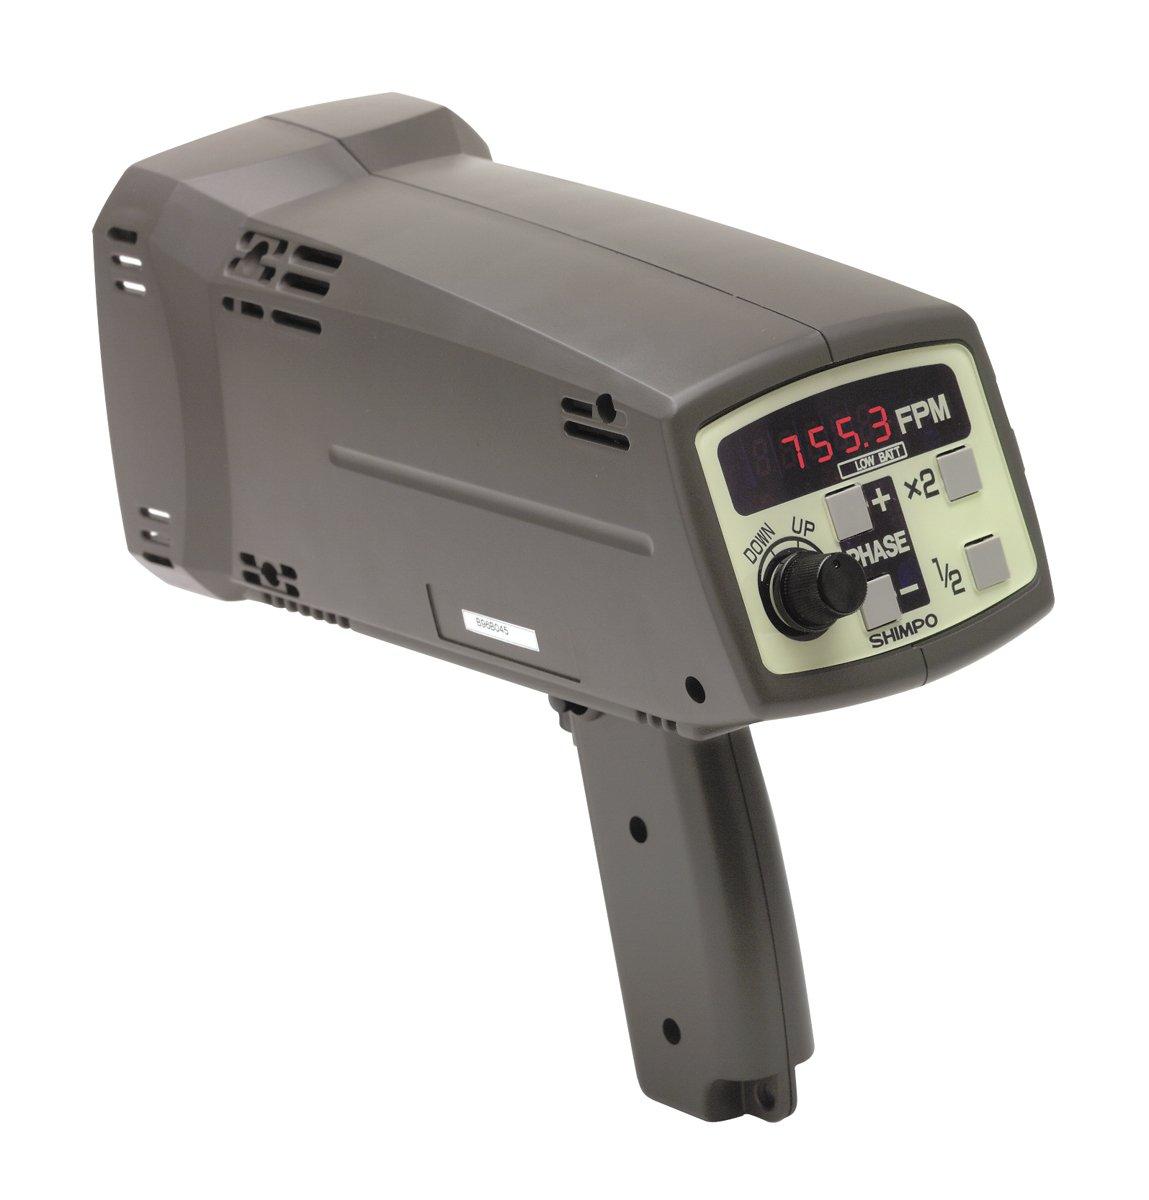 Shimpo DT-725 Internal Battery Powered Digital Stroboscope, 115V AC Charger, +/- 0.02 percent Accuracy, 40.0 - 12500 FPM Range